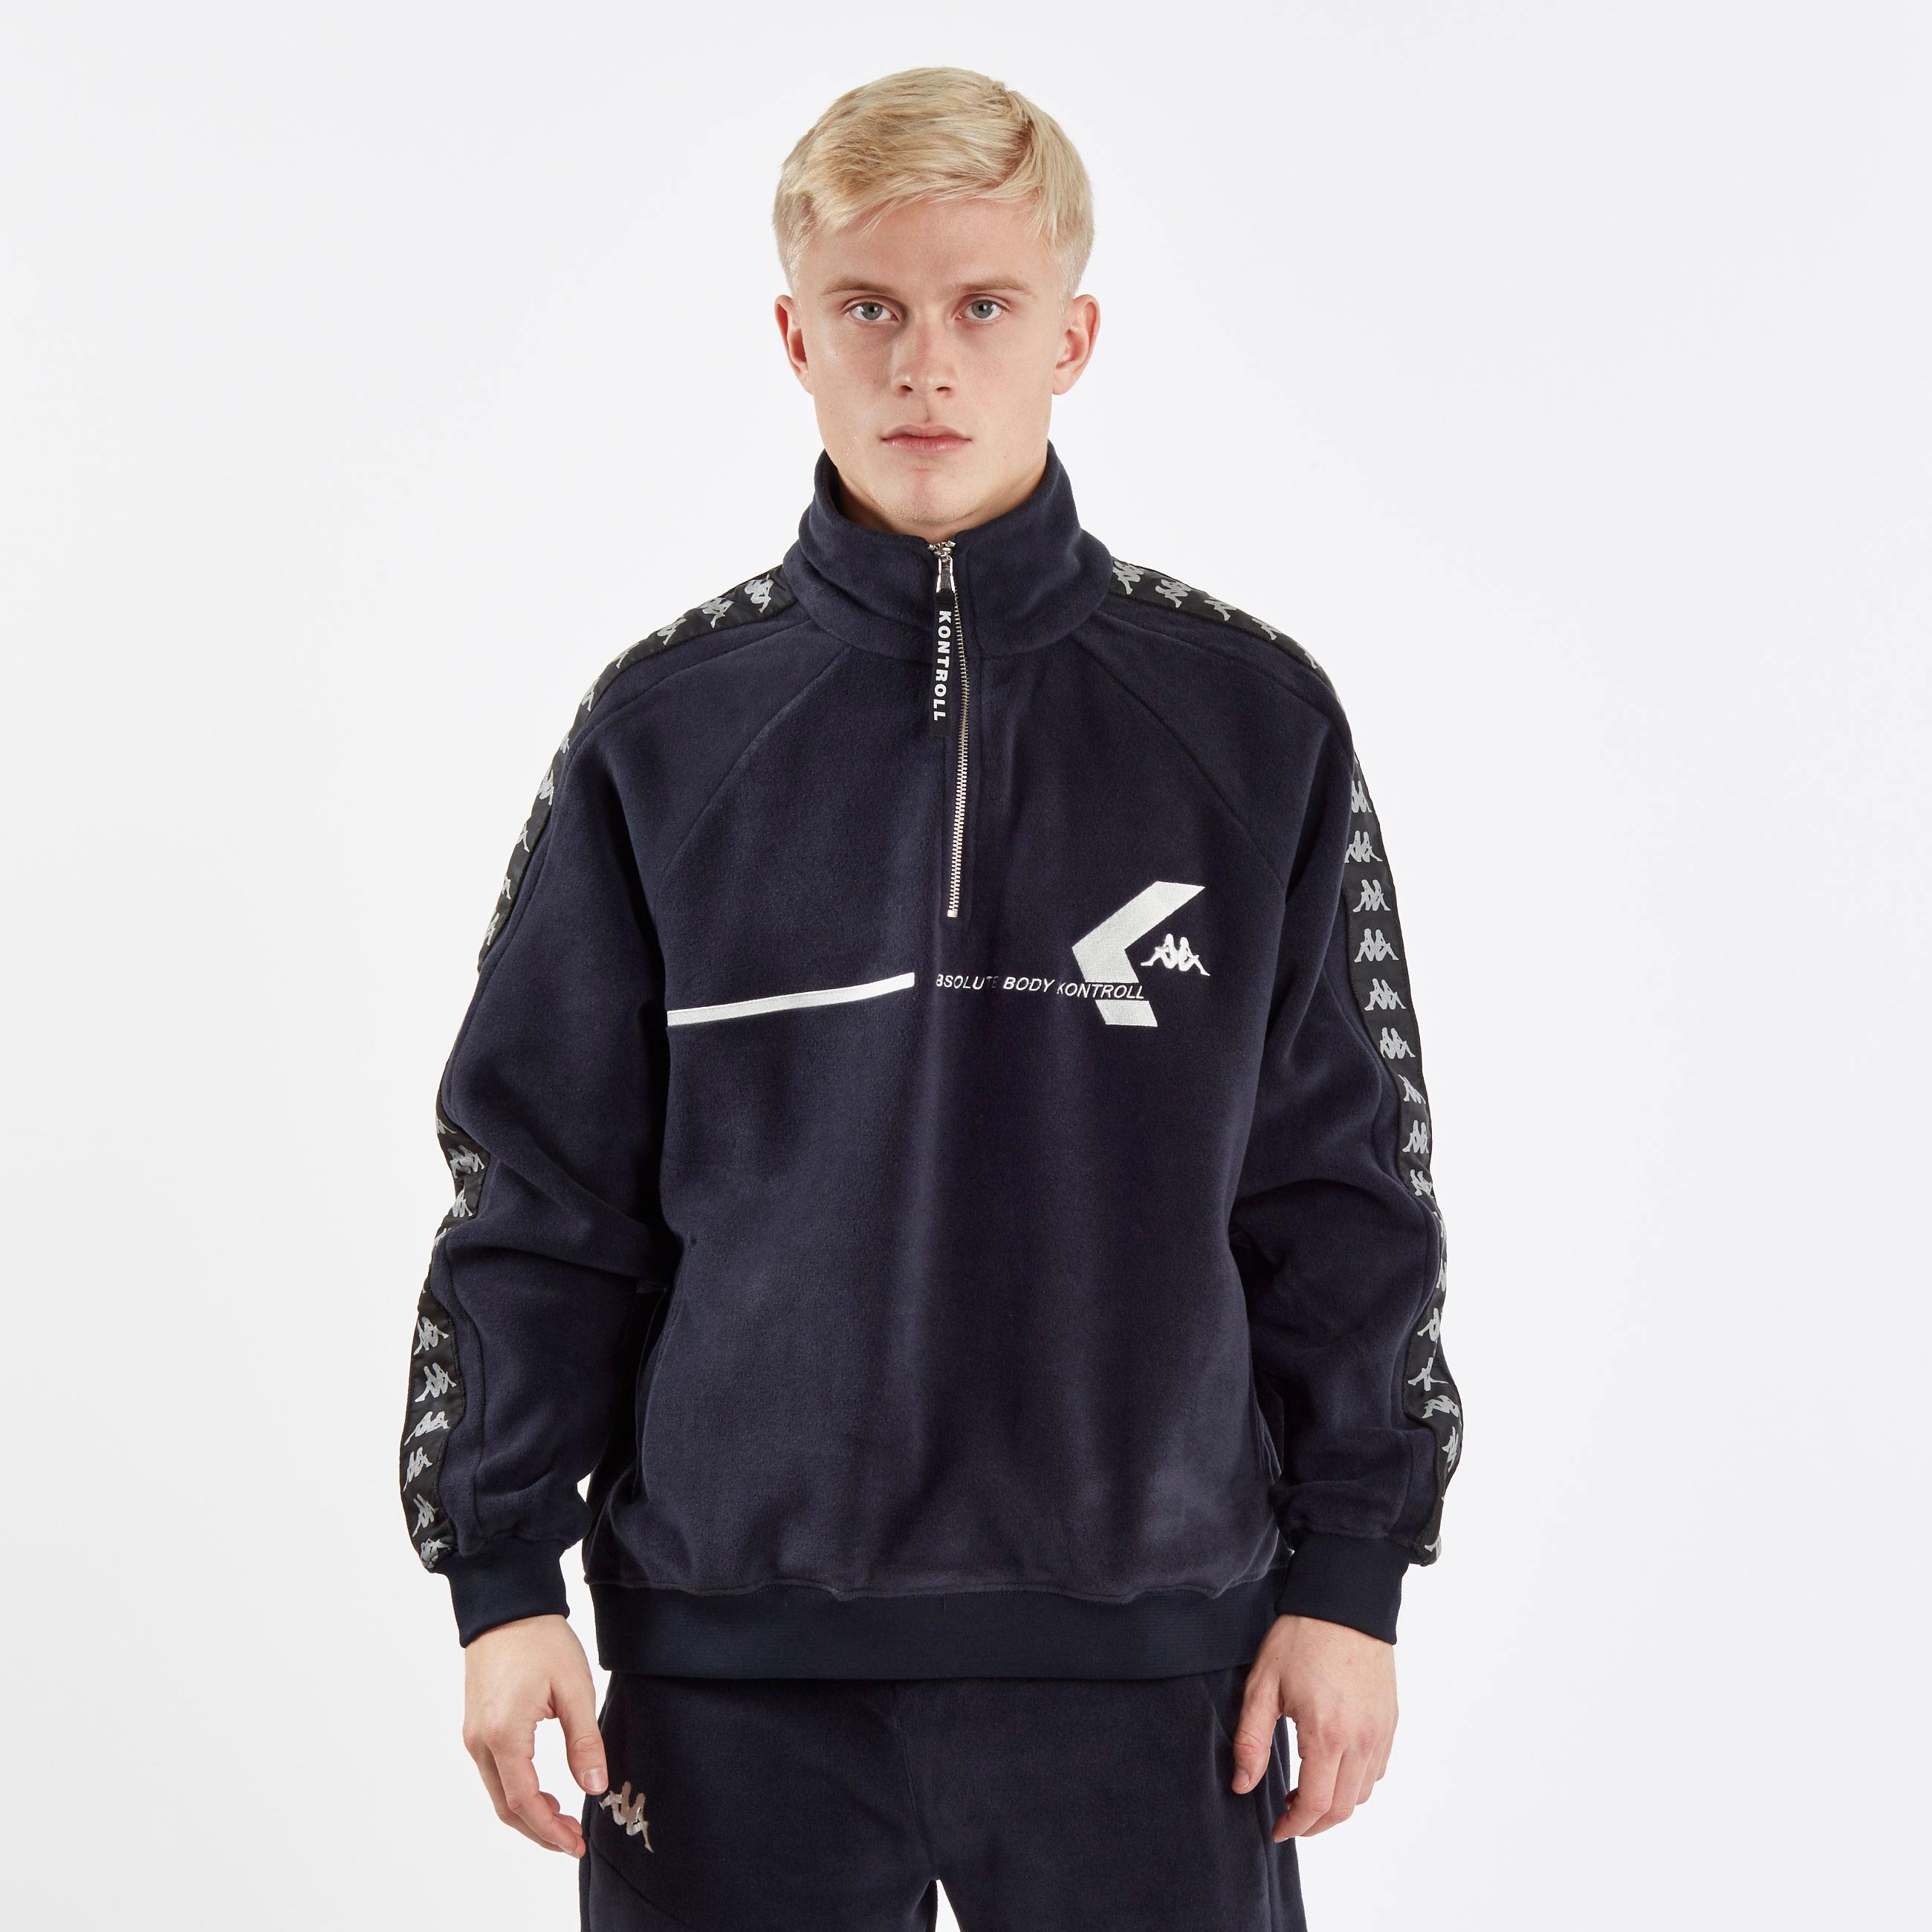 Kappa Kontroll Polar Fleece - 304jki0-nvy - Sneakersnstuff ... 2acc6ea444d5a